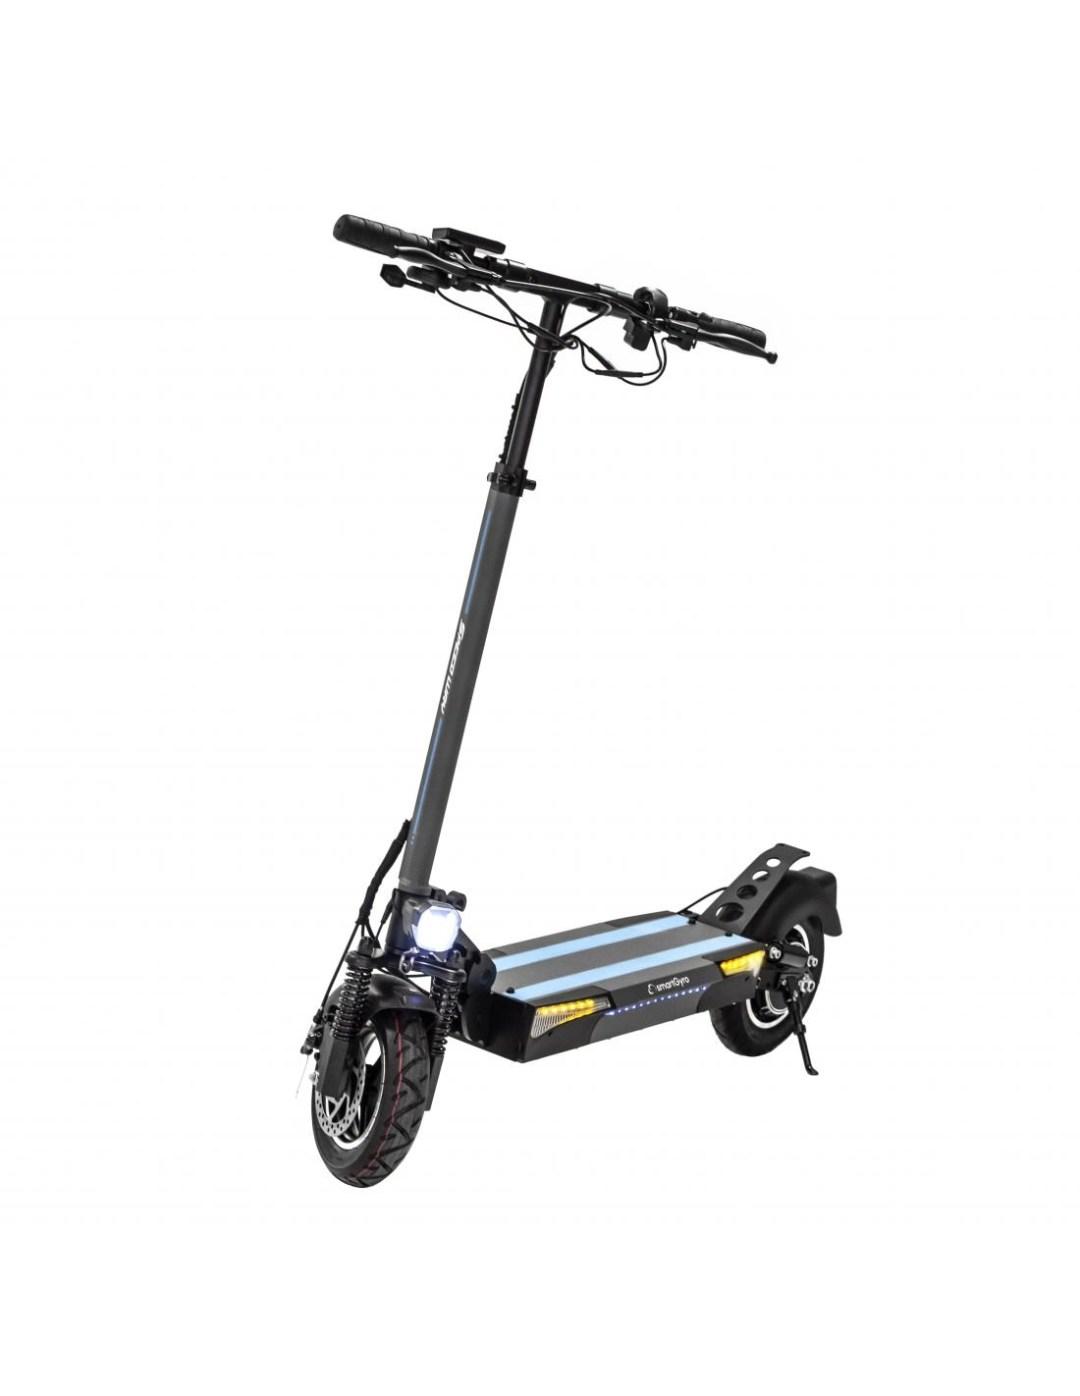 Patinete eléctrico smartgyro speedway v20 4